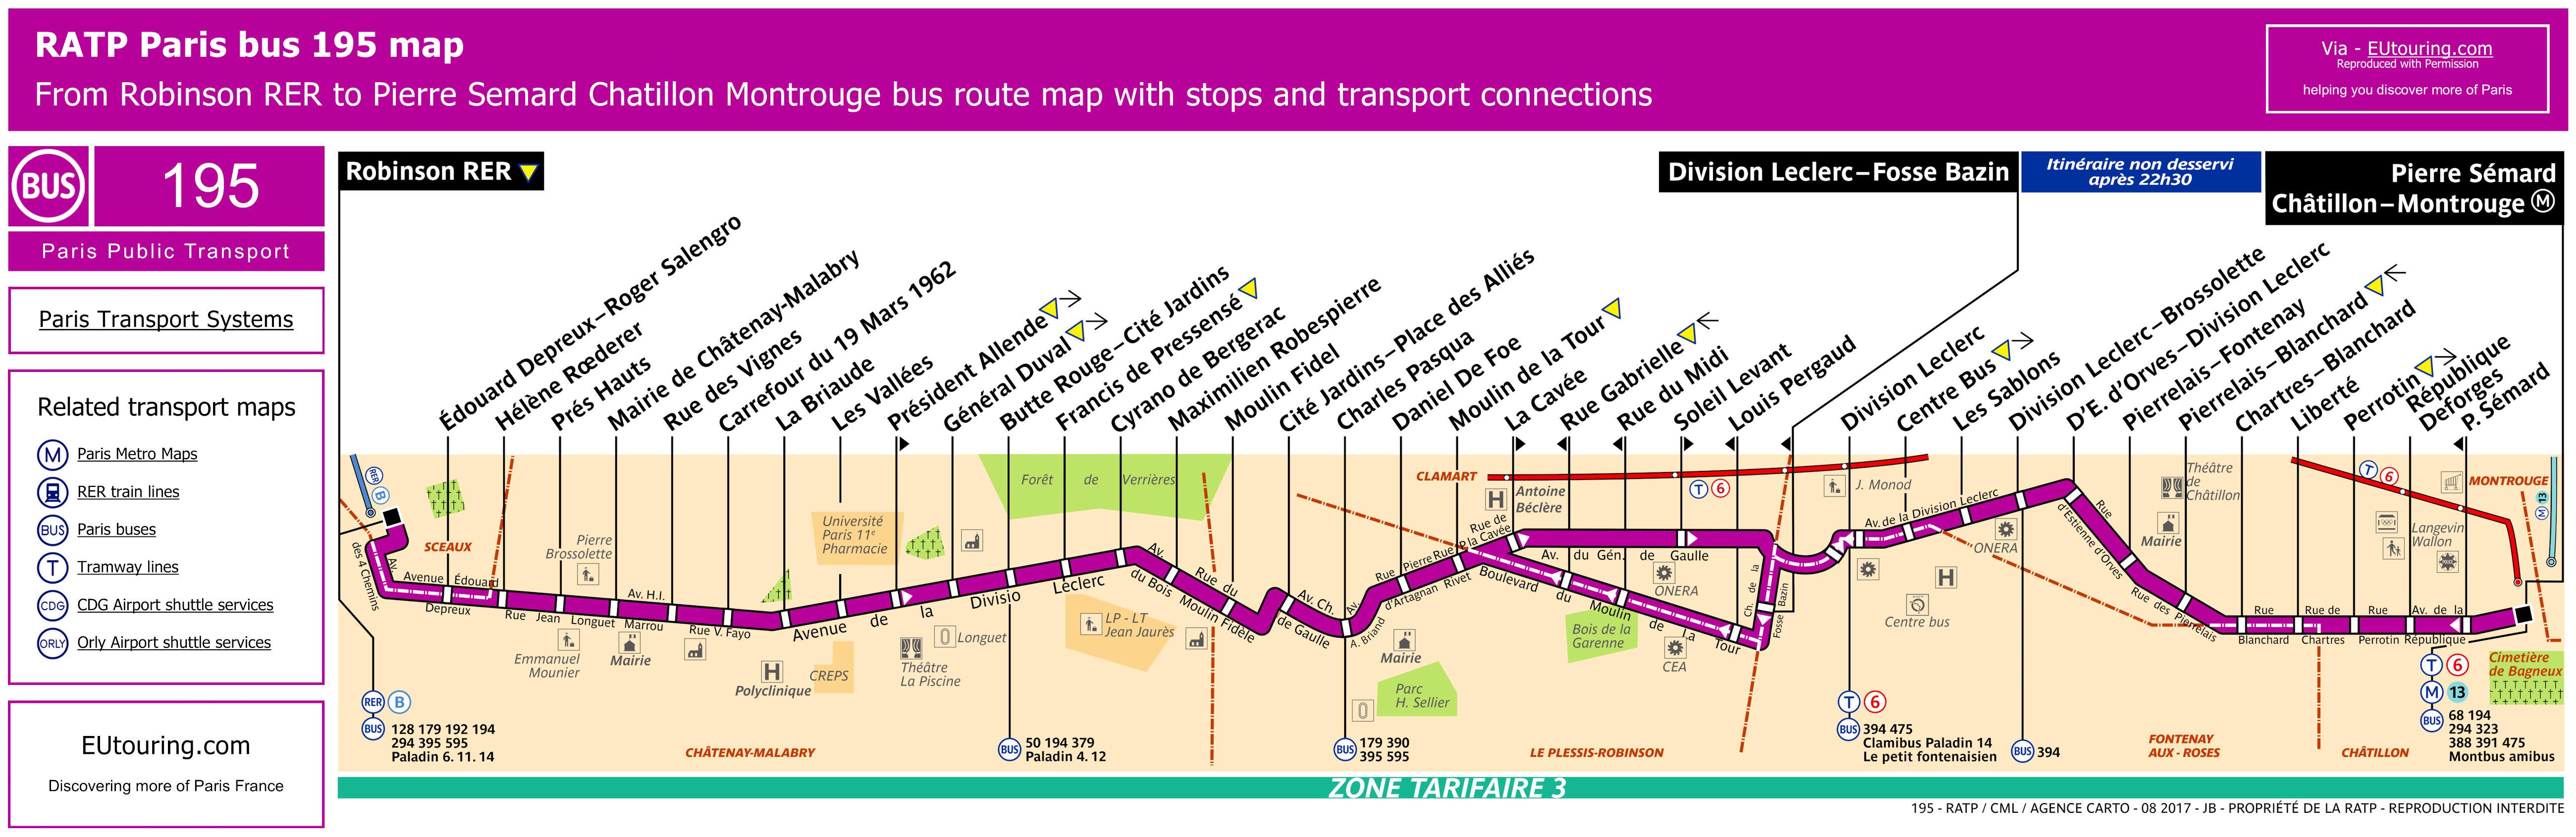 paris bus map pdf download